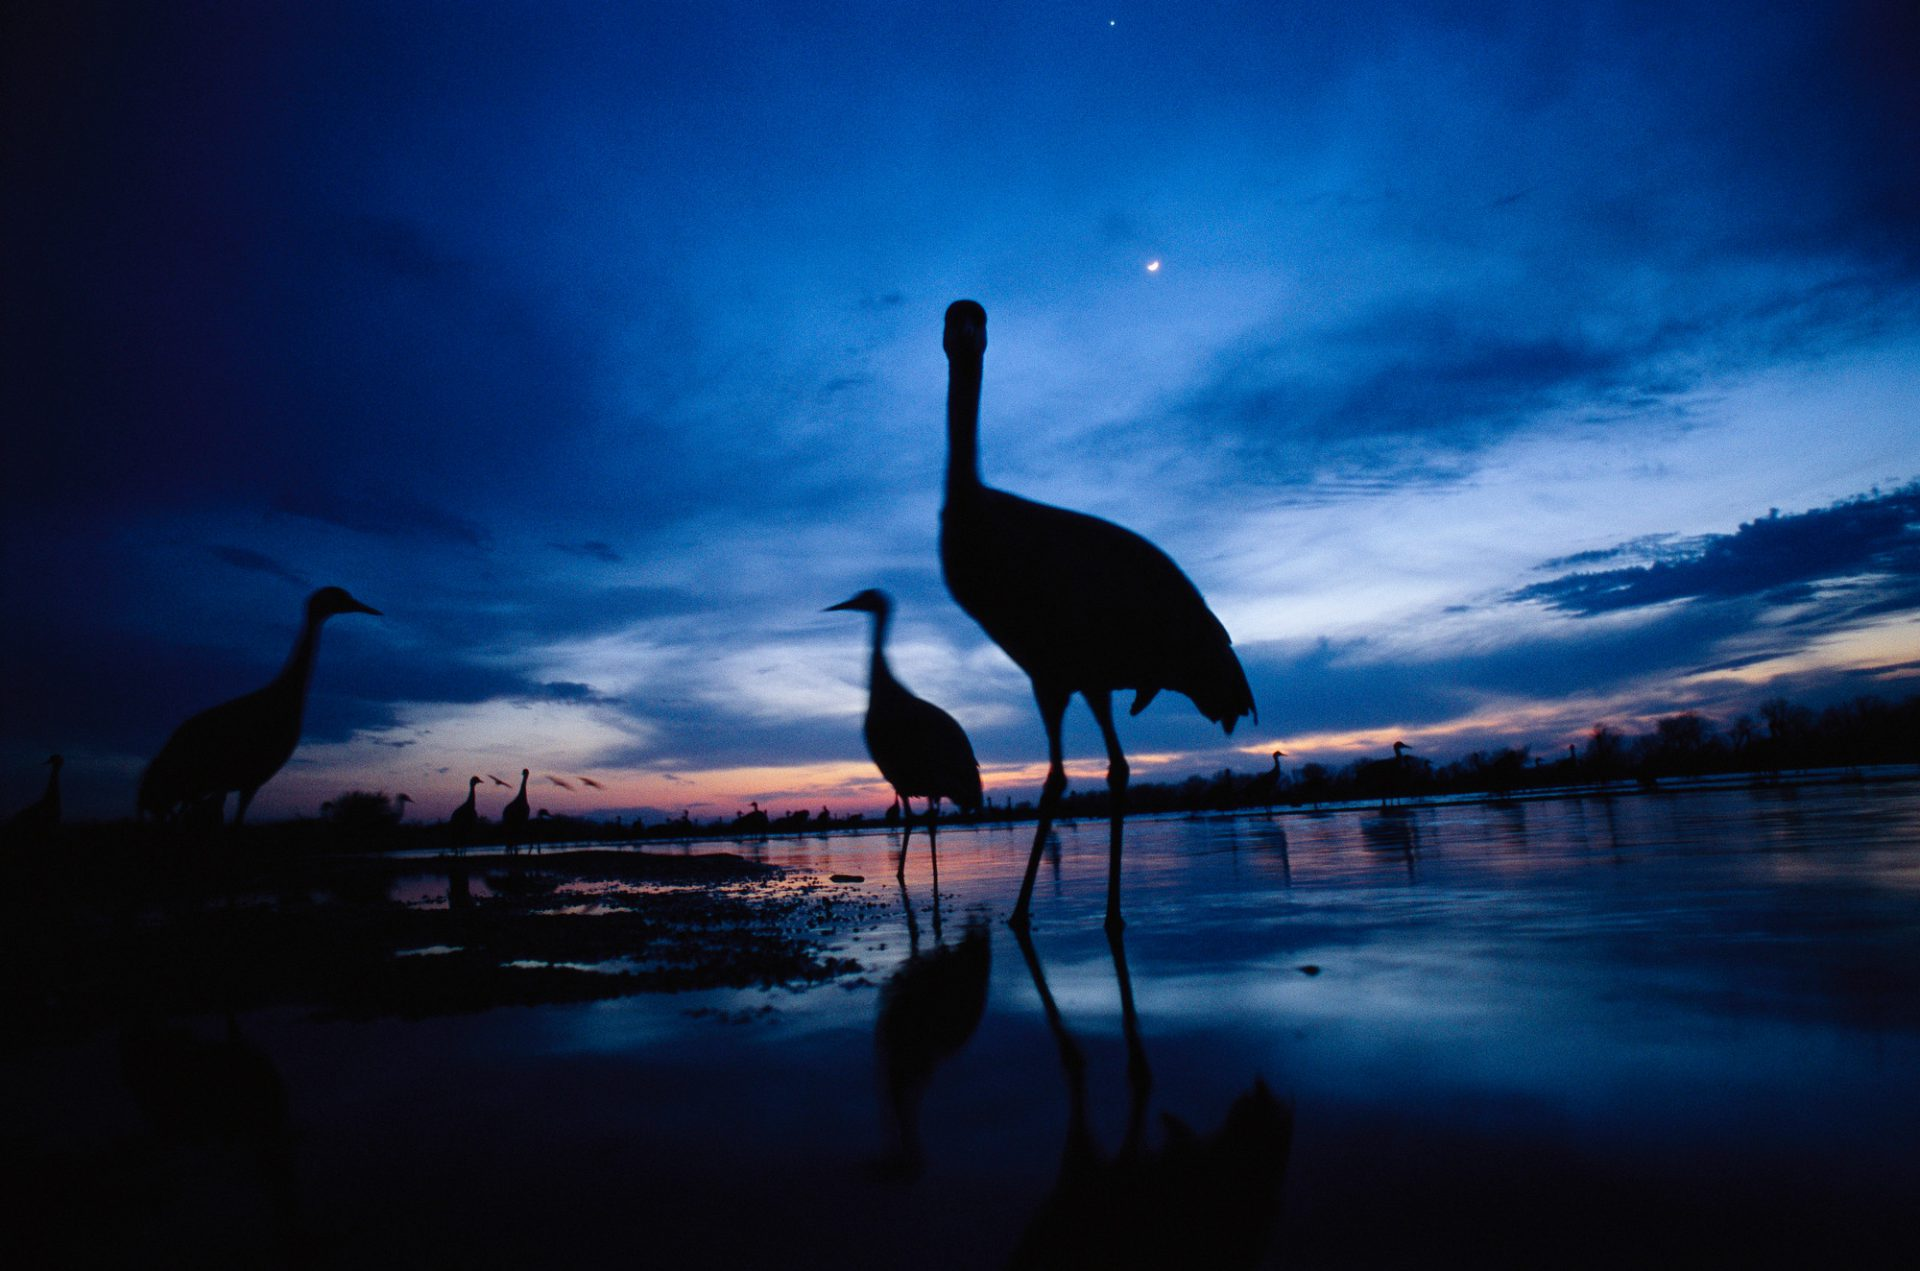 It Was Twilight And Sandhill Cranes >> Bir003 00421 Joel Sartore